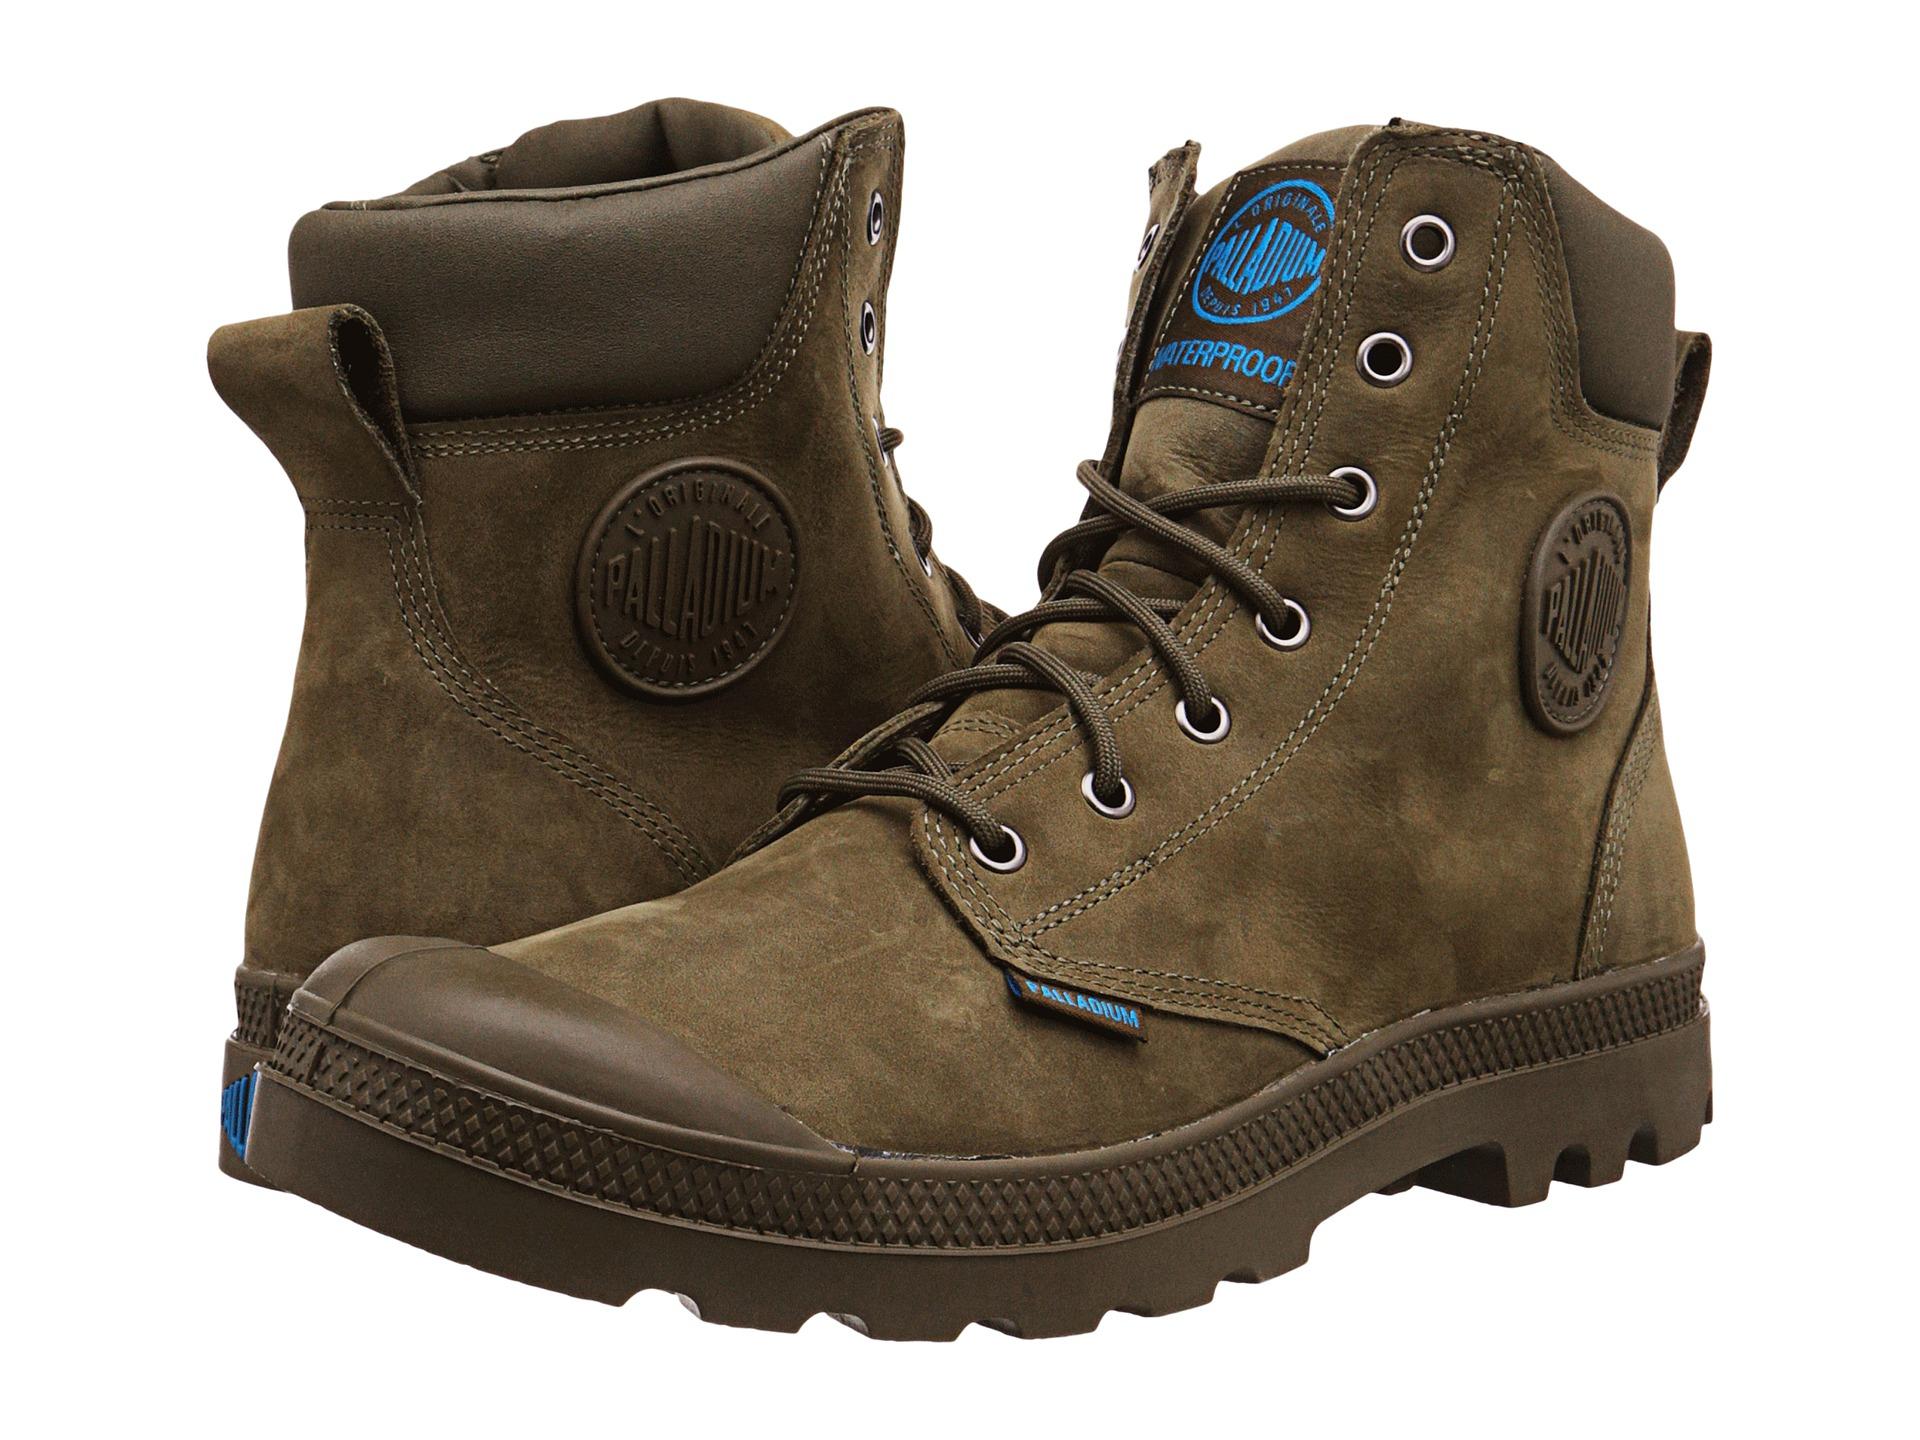 Womens Palladium Pampa Cuff Wp Lux Boots Olive Drab DUS79557